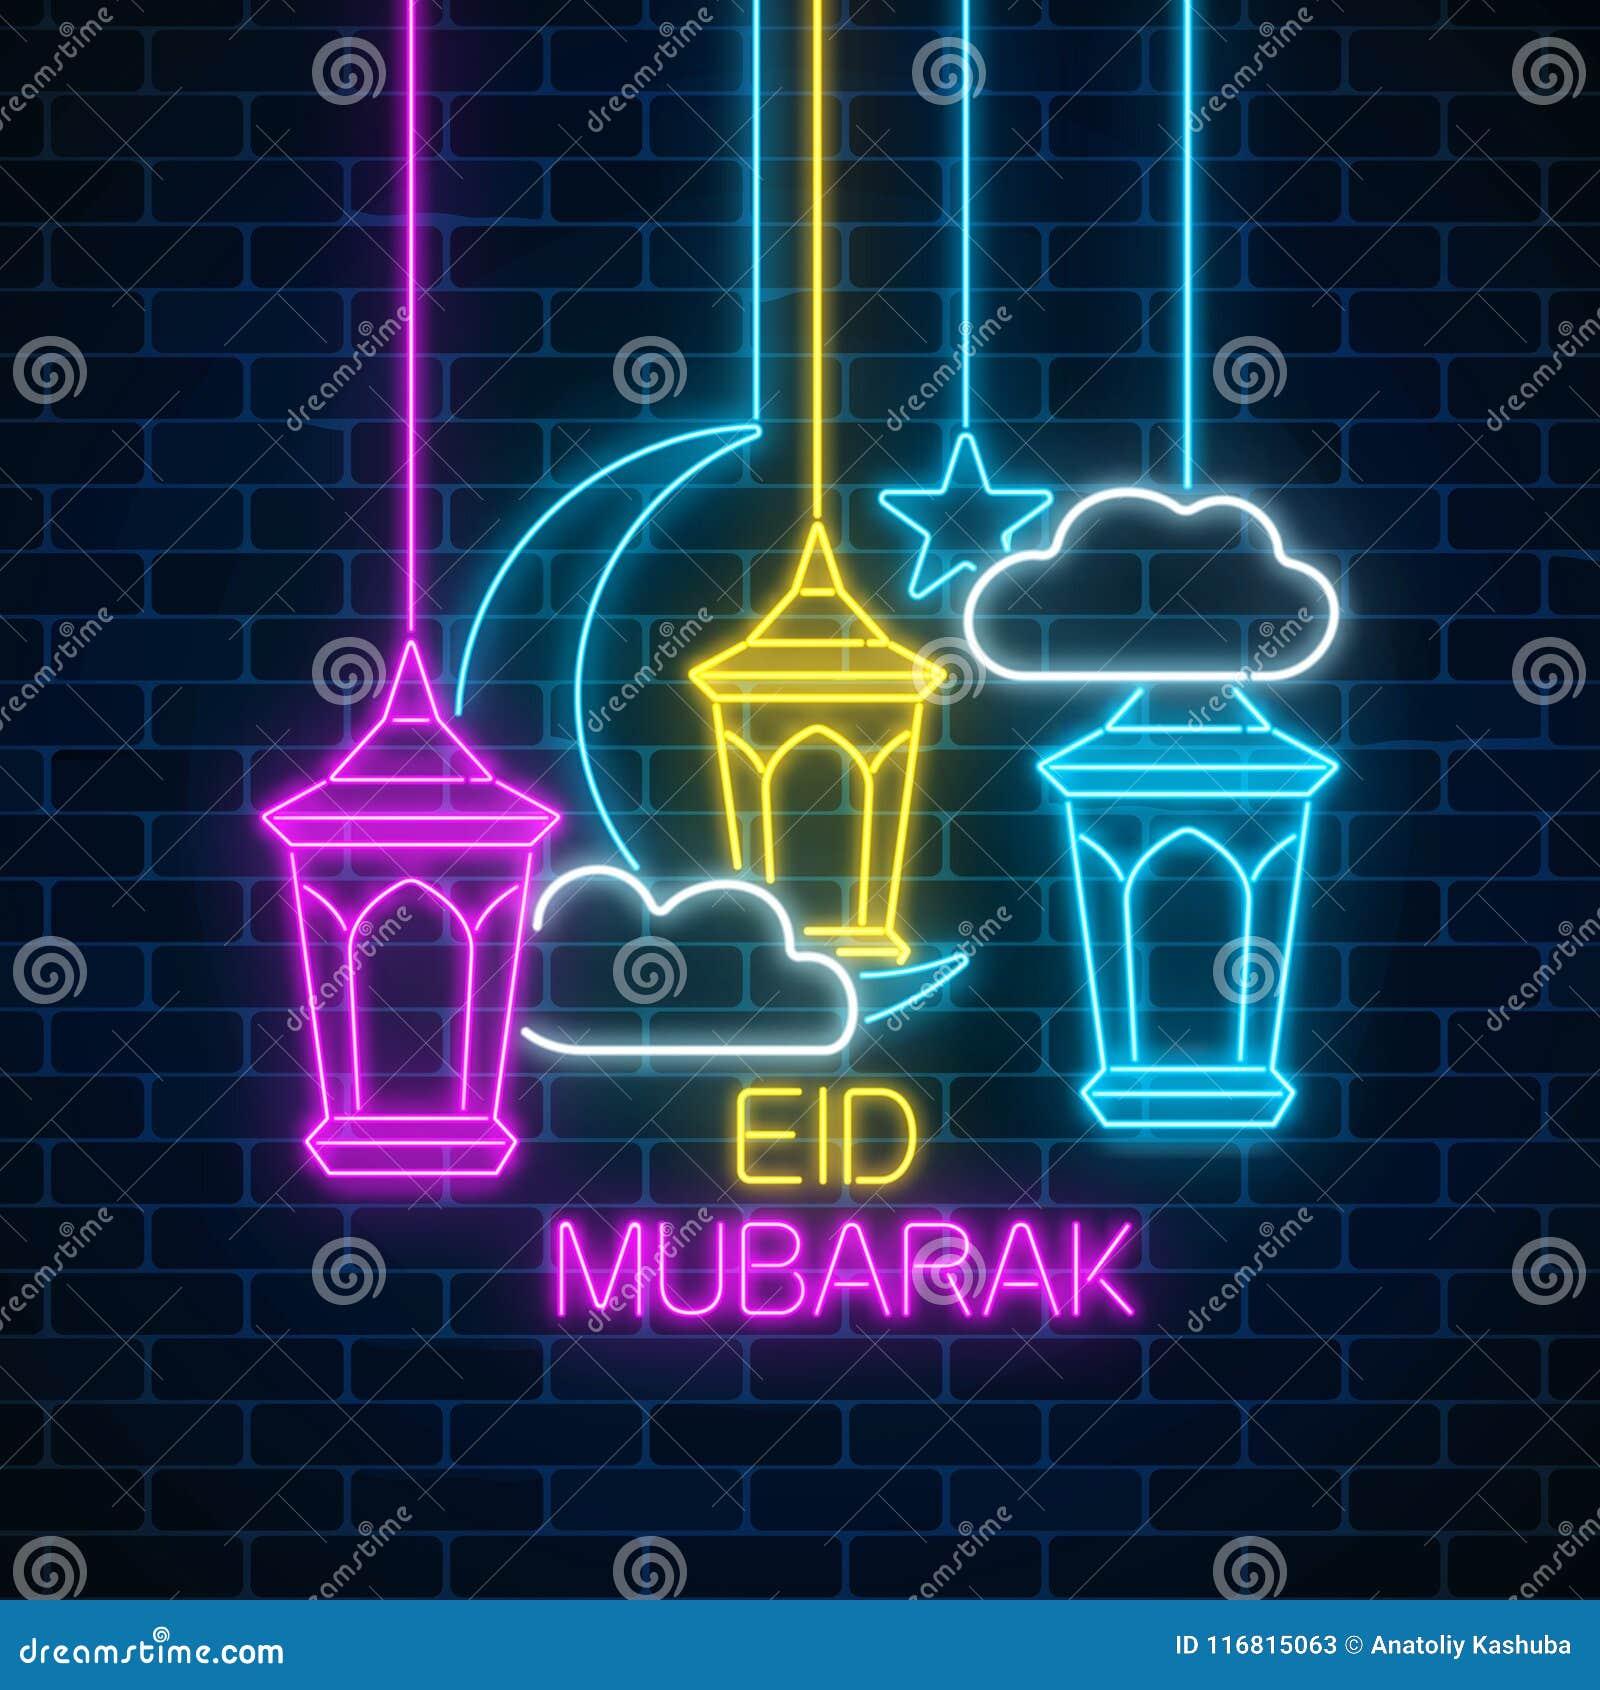 Ramadan Greeting Card With Fanus Lanterns Star And Crescent Eid